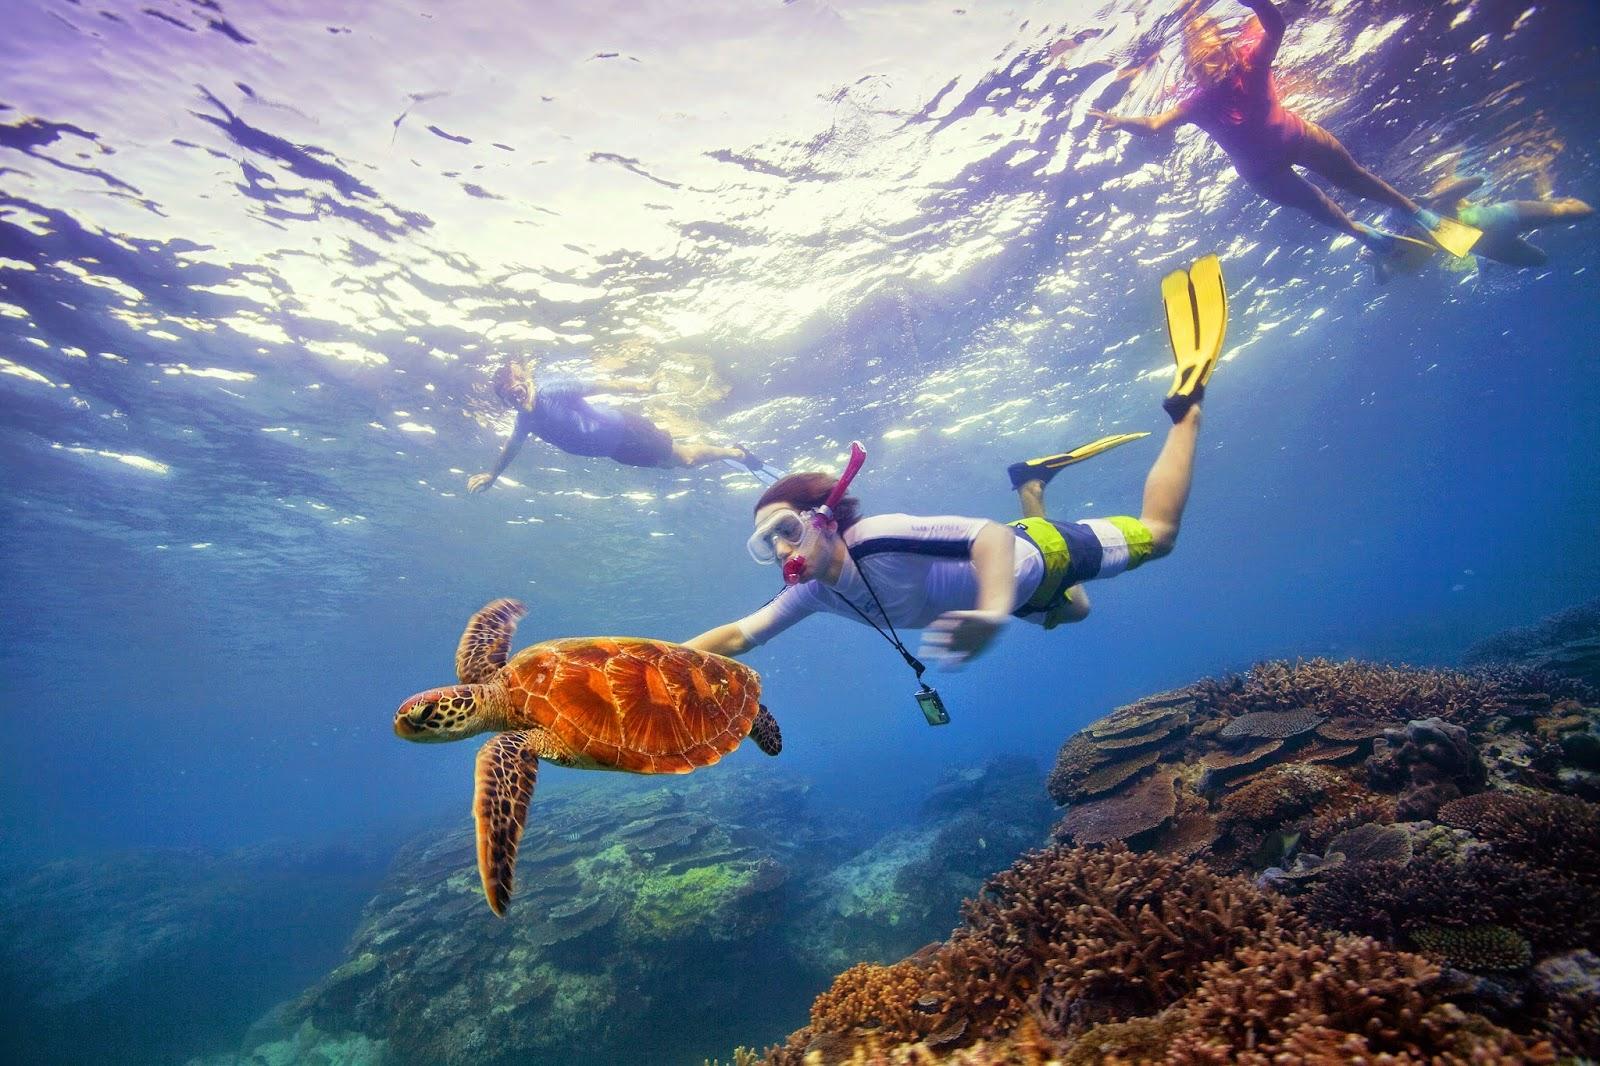 vacances de la côte d'or en Australie, l'aventure en Australie, les koalas étreindre, kangourous, snorkeling dans la Great Barrier Reef, plongée, Warner Bros Movie World, Sea World, Dreamworld